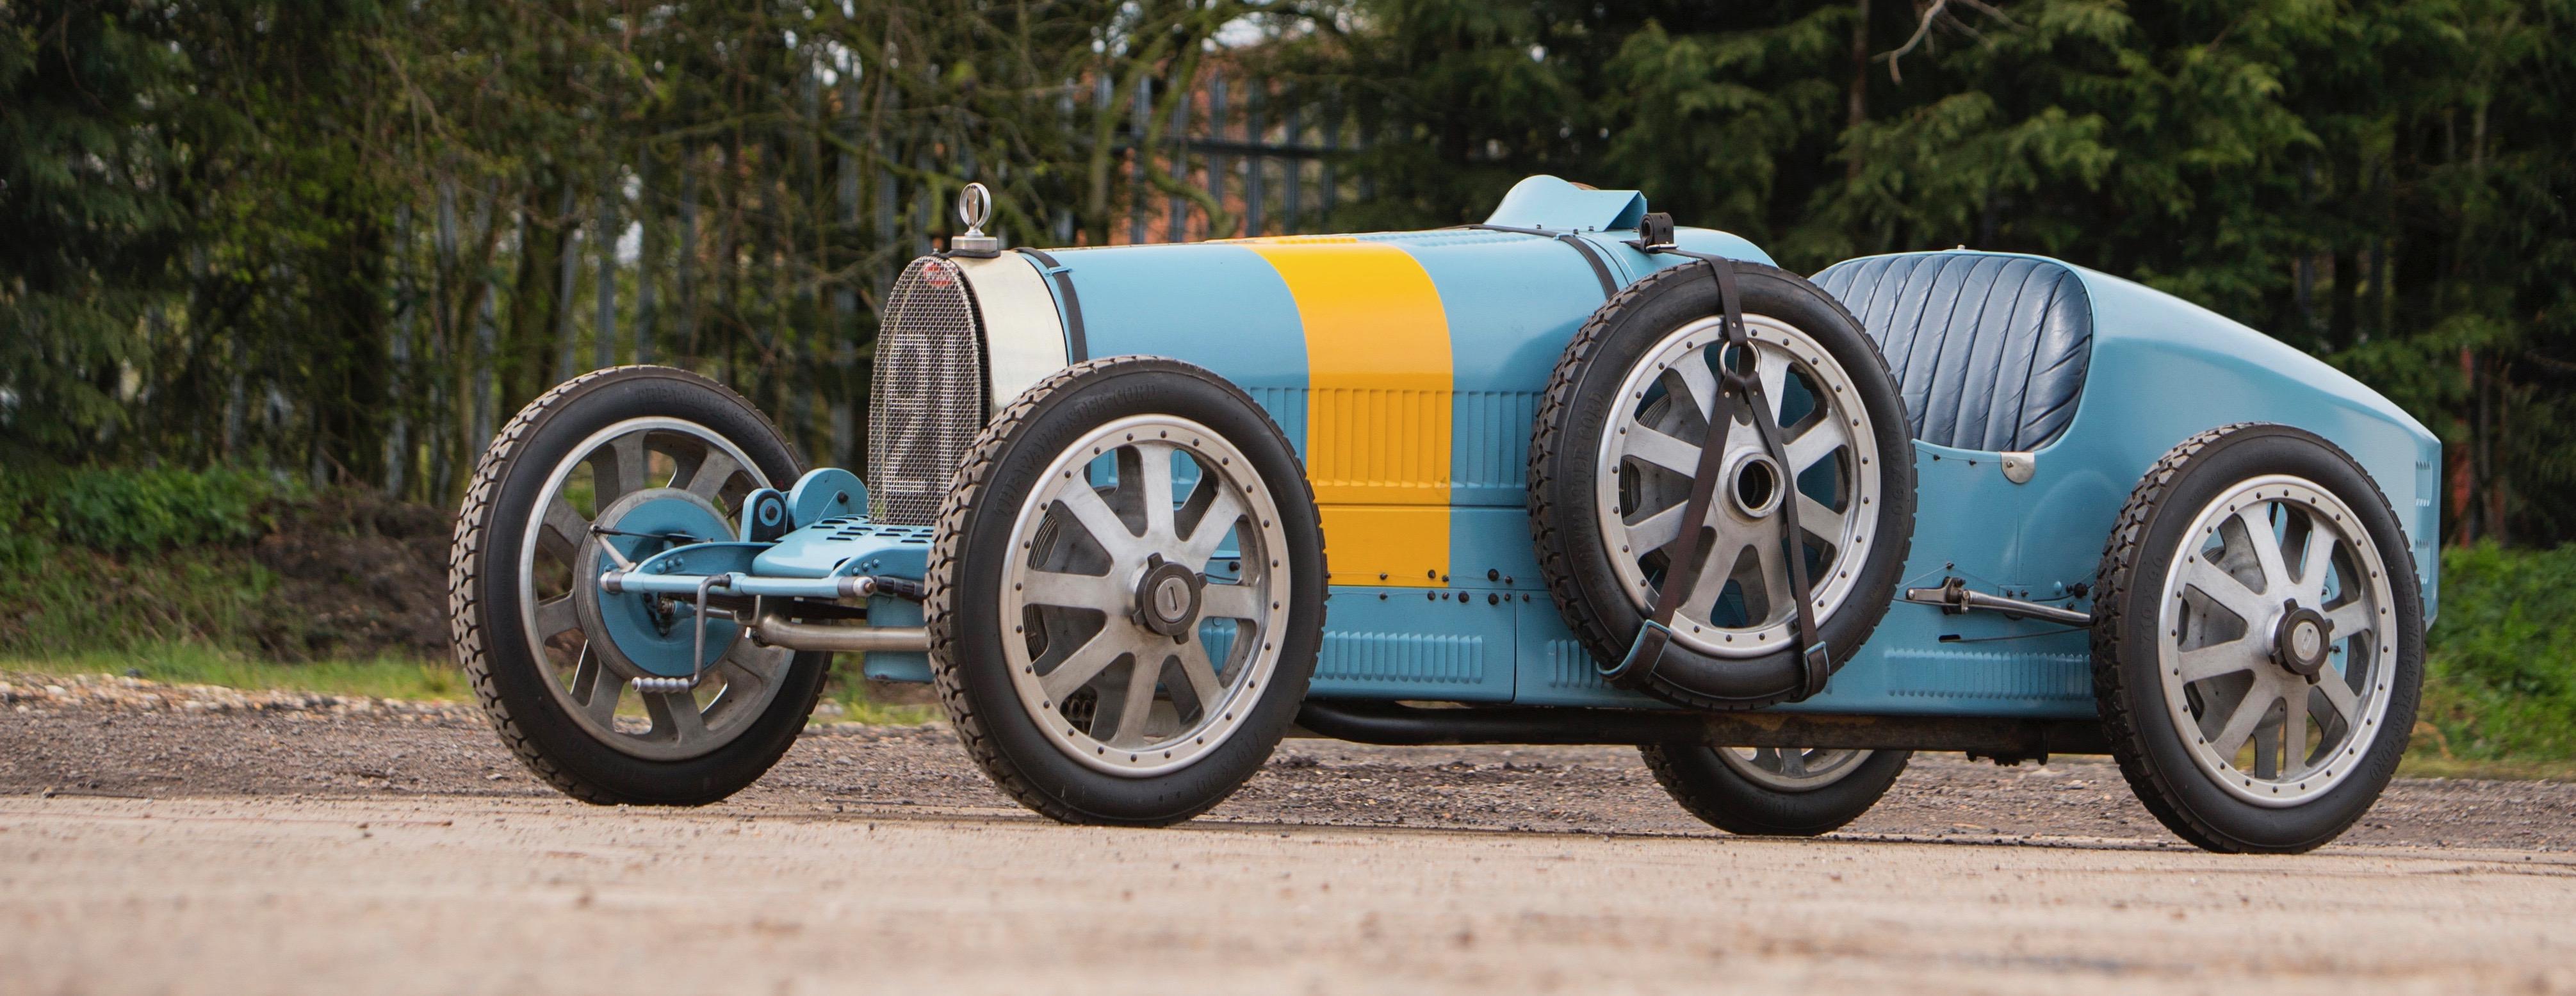 Bonhams, Vintage racing cars highlight Bonhams Paris docket, ClassicCars.com Journal